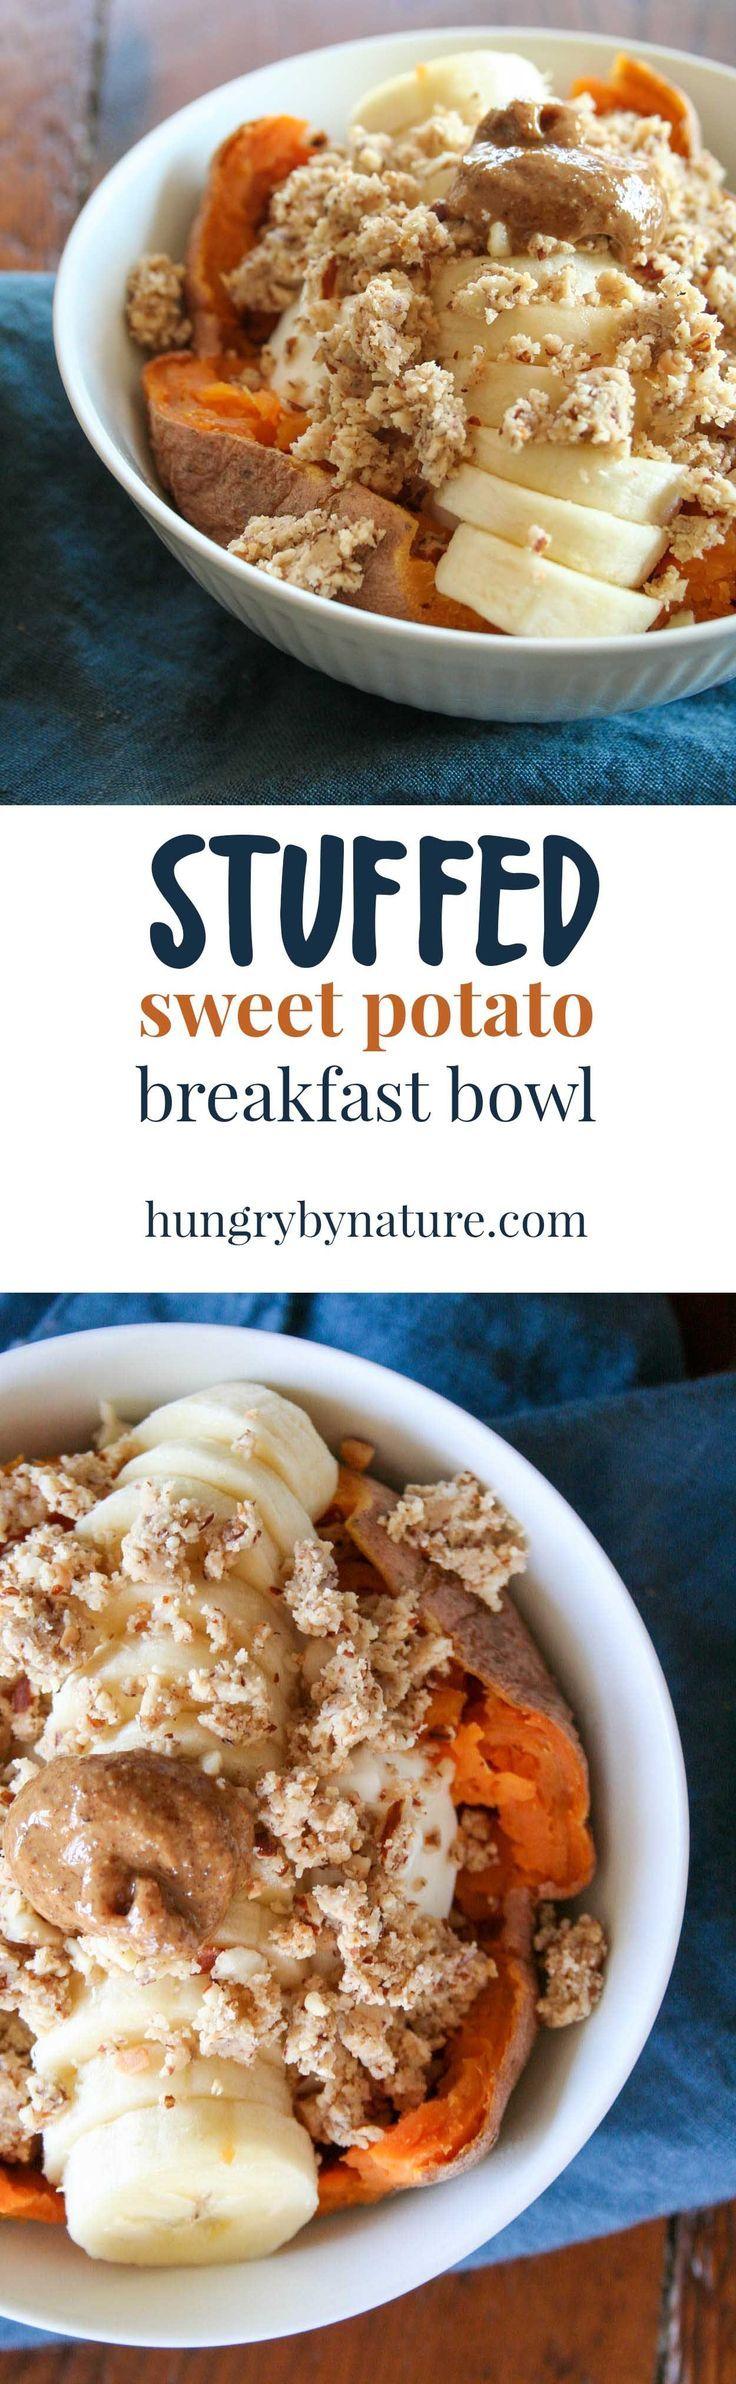 STUFFED sweet potato breakfast bowl   Siggi's, Wella Bar, easy, gluten free, recipe, simple, healthy, almond butter   http://hungrybynature.com